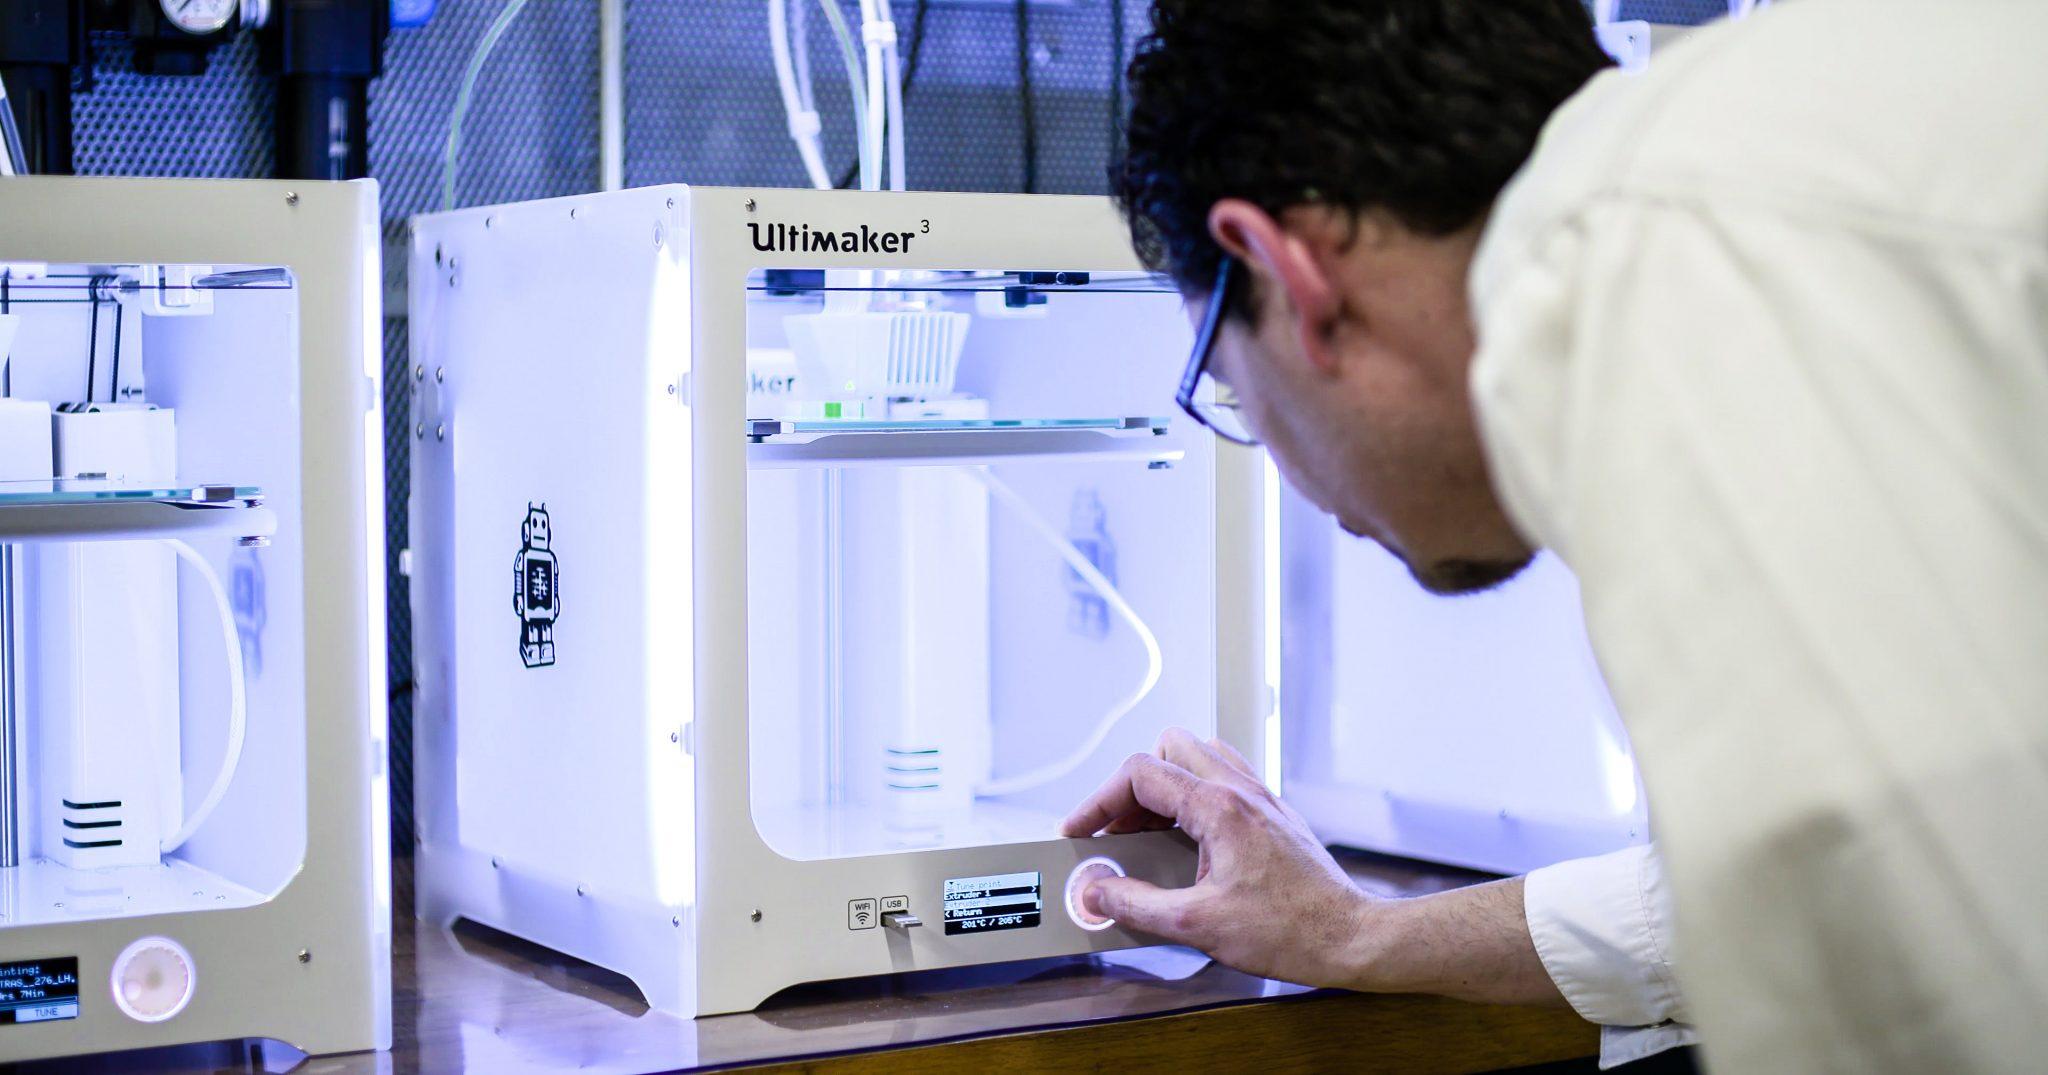 Ultimaker 3 3D printers. Photo via Ultimaker